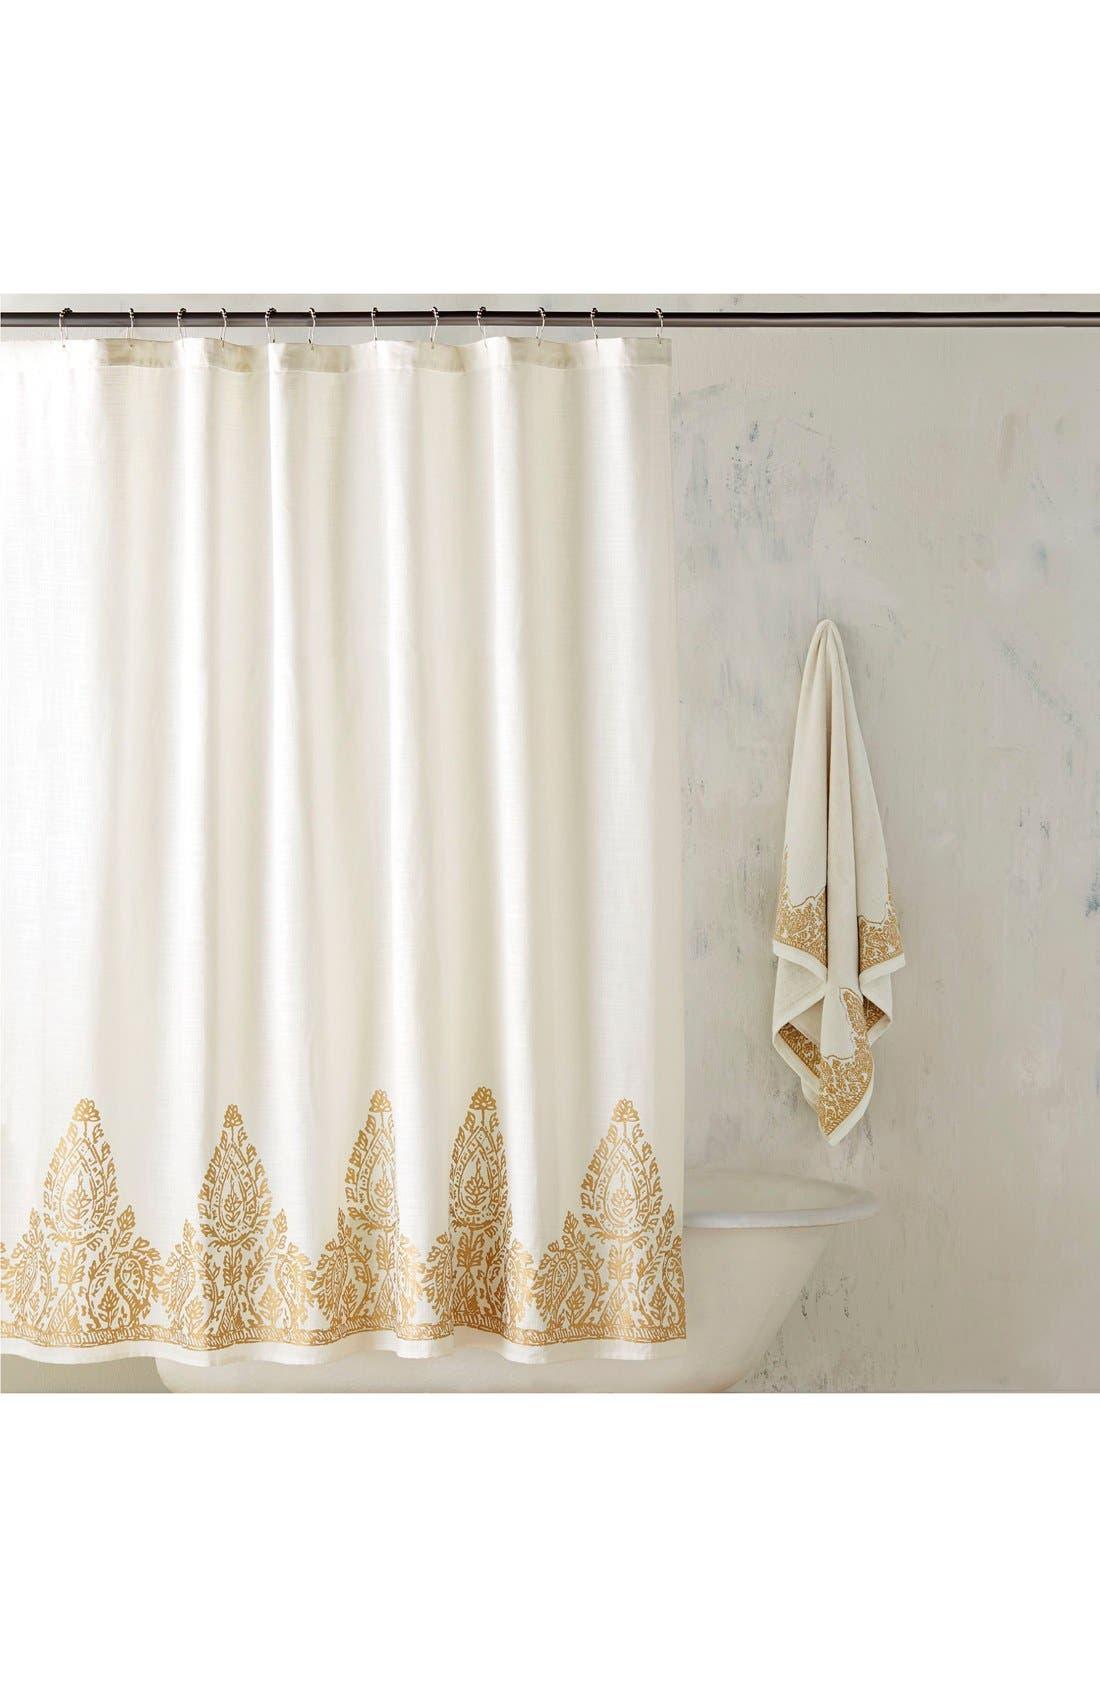 'Nadir' Shower Curtain,                             Main thumbnail 1, color,                             100